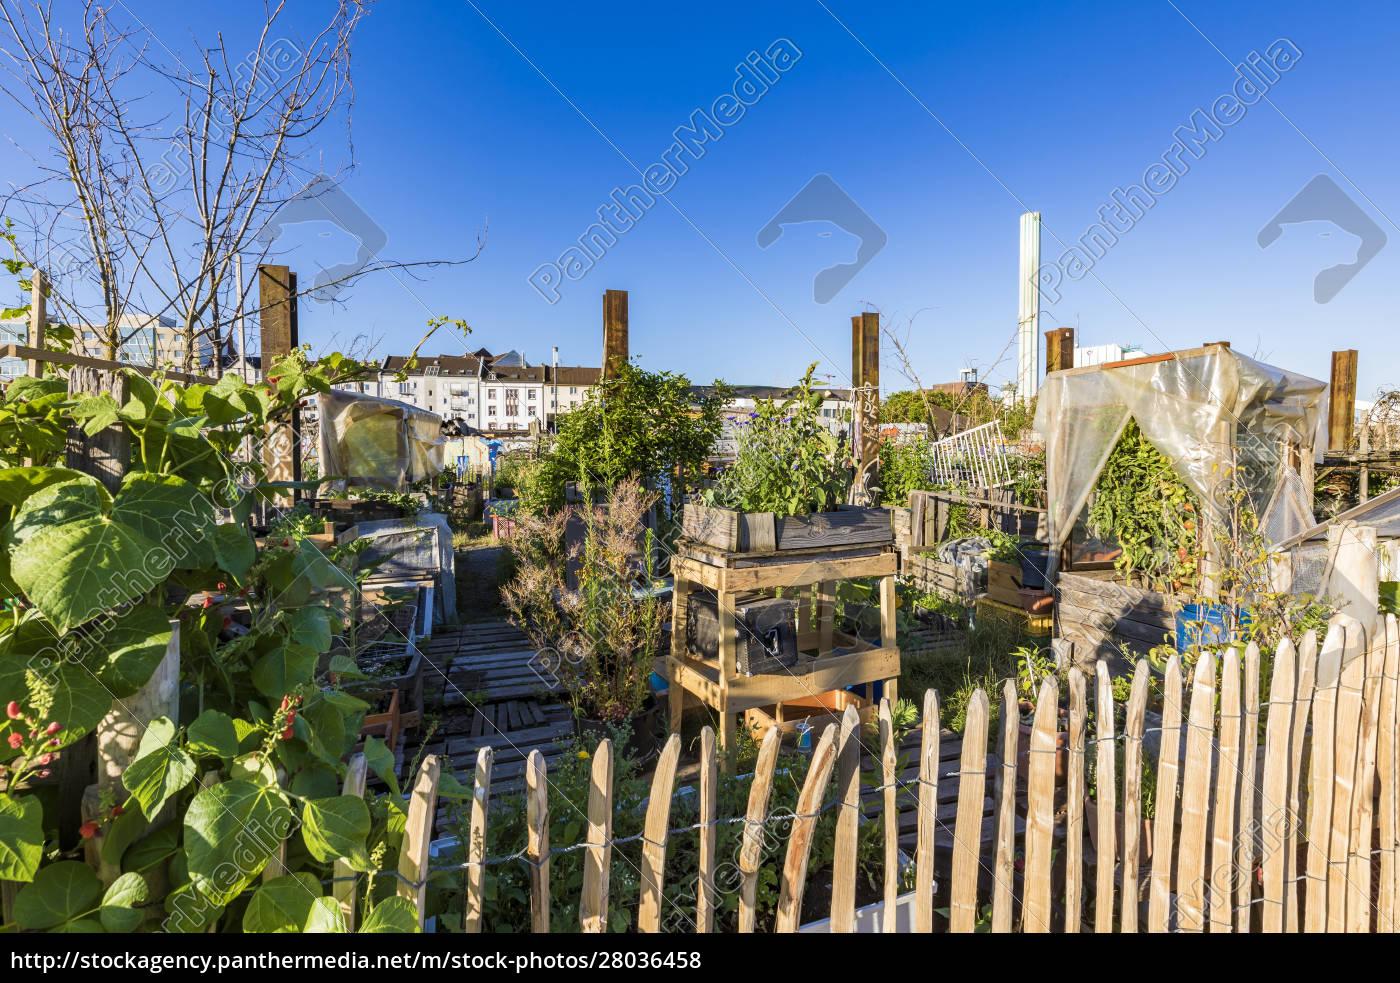 plants, growing, in, community, garden, at - 28036458